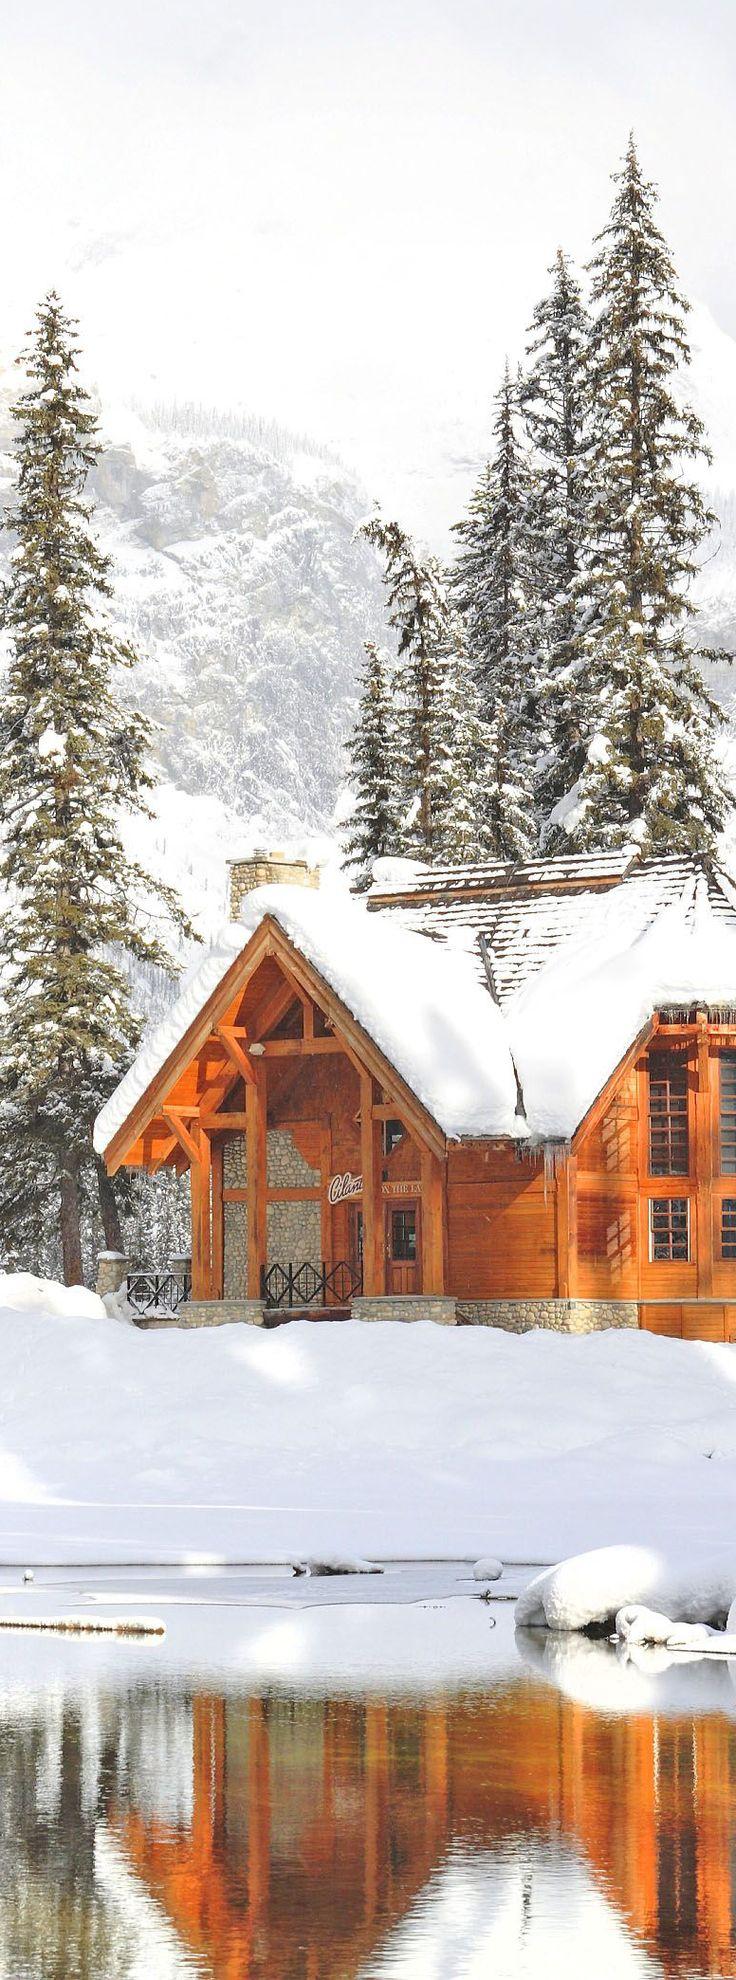 The Top Rustic Lodges Amp Cabins Emerald Lake Lodge Log